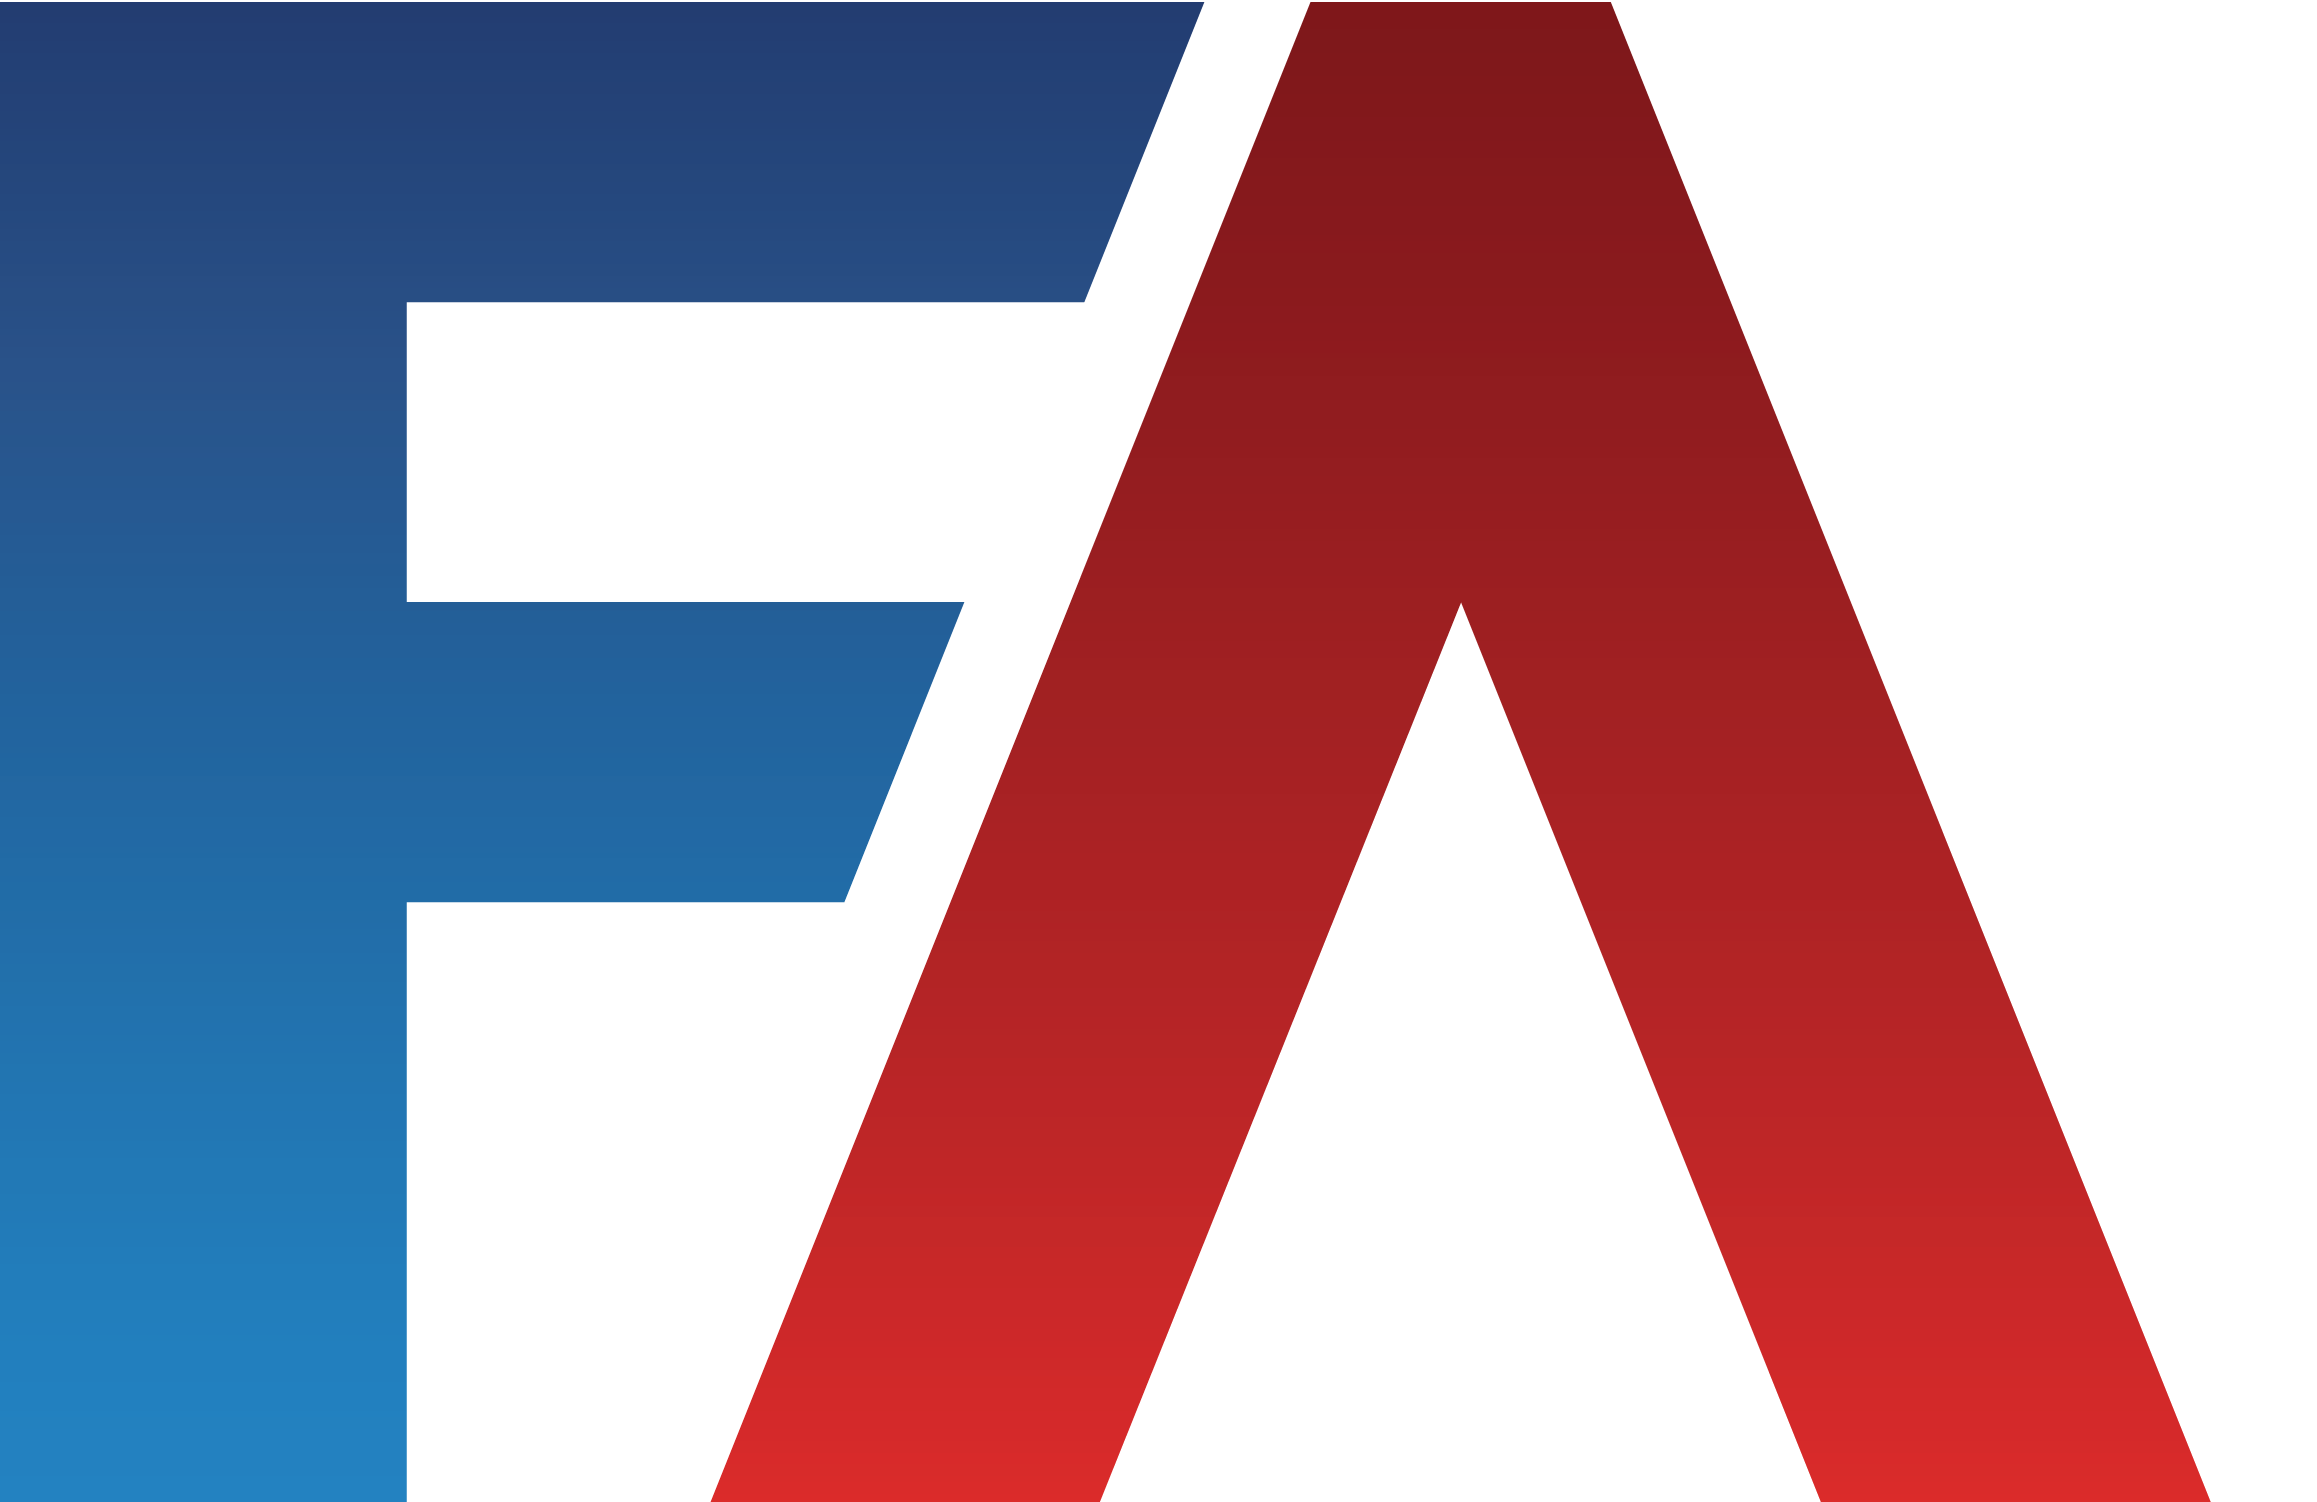 Fantasy Sports Business: National Media Playing Politics | FantasyAlarm.com